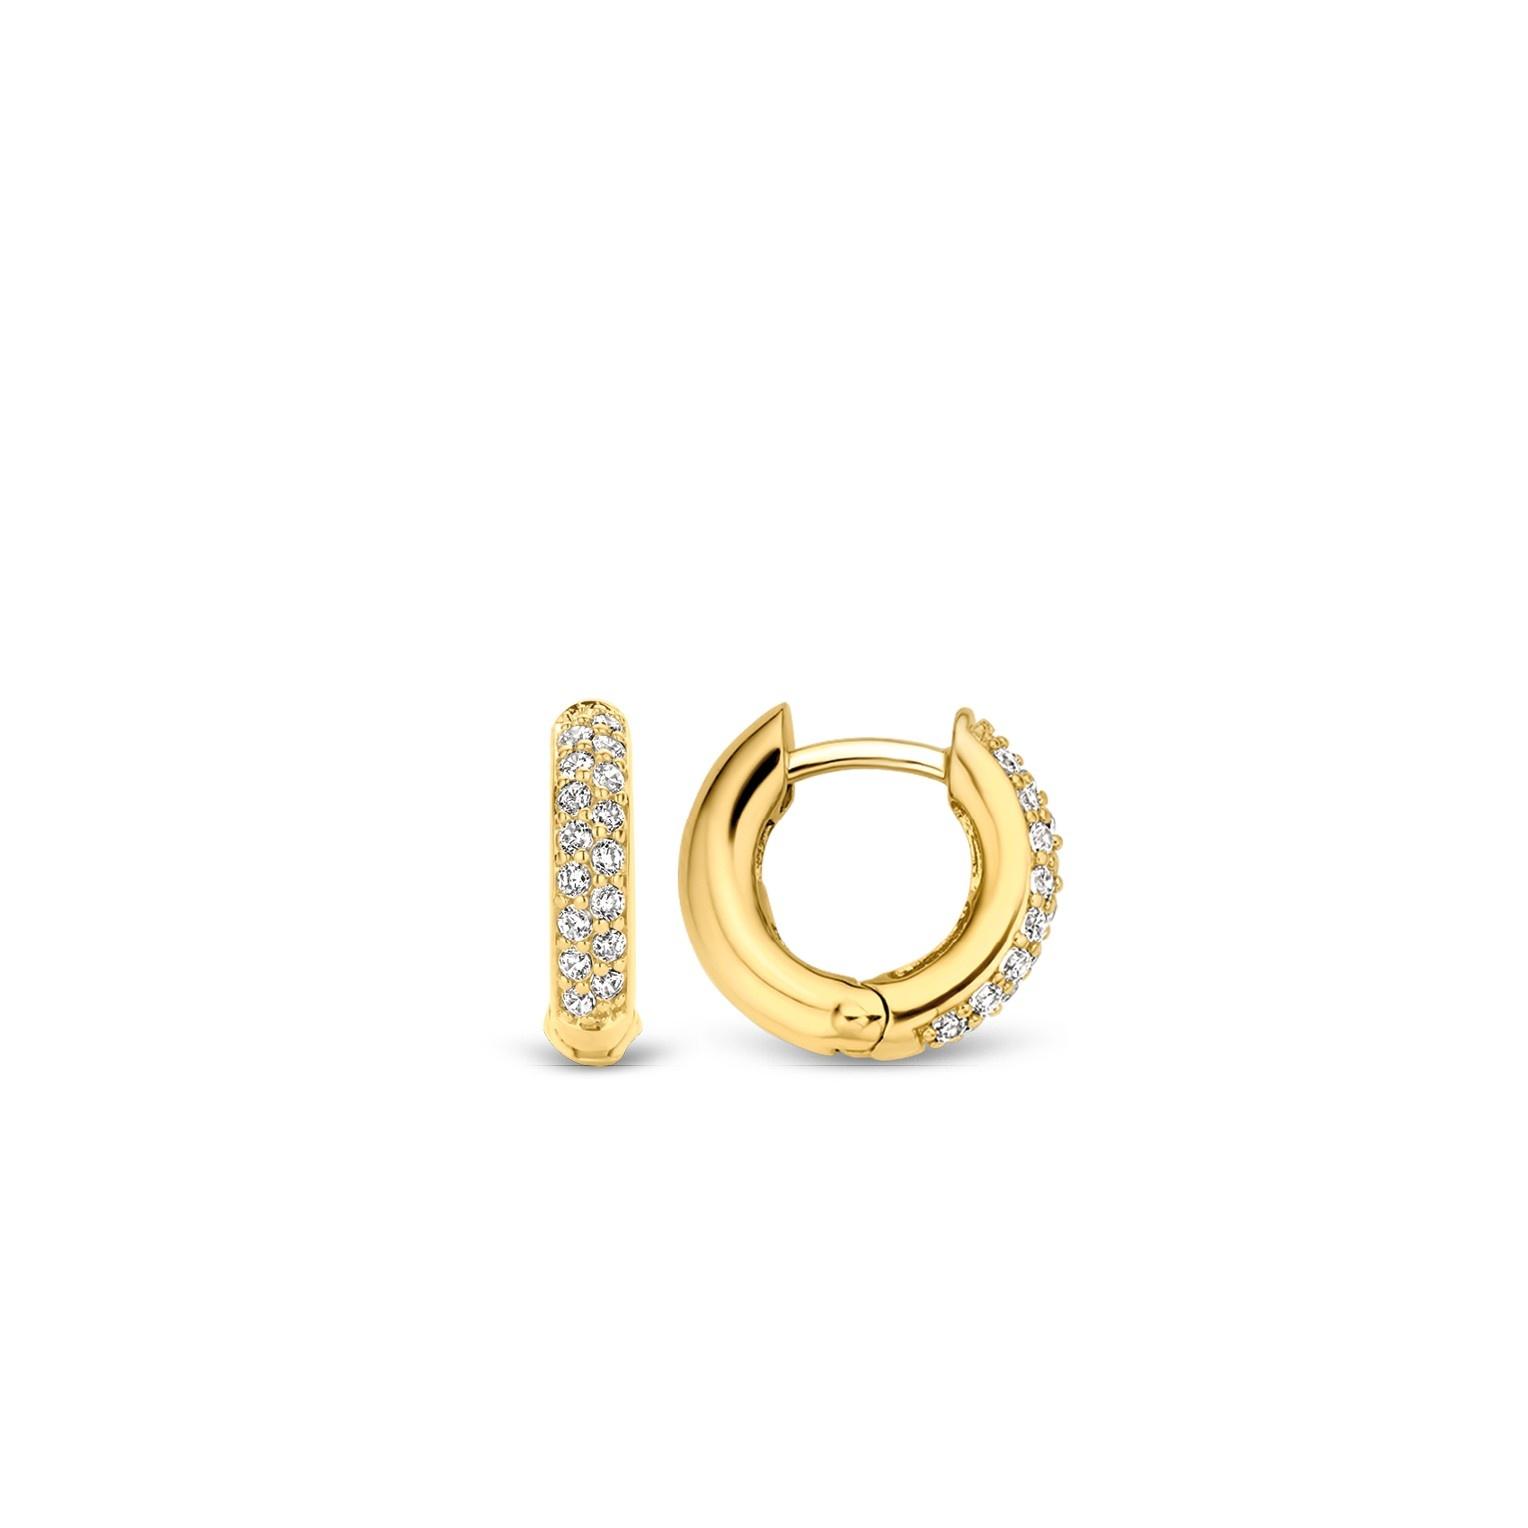 TI SENTO - Milano Earrings 7210ZY-3